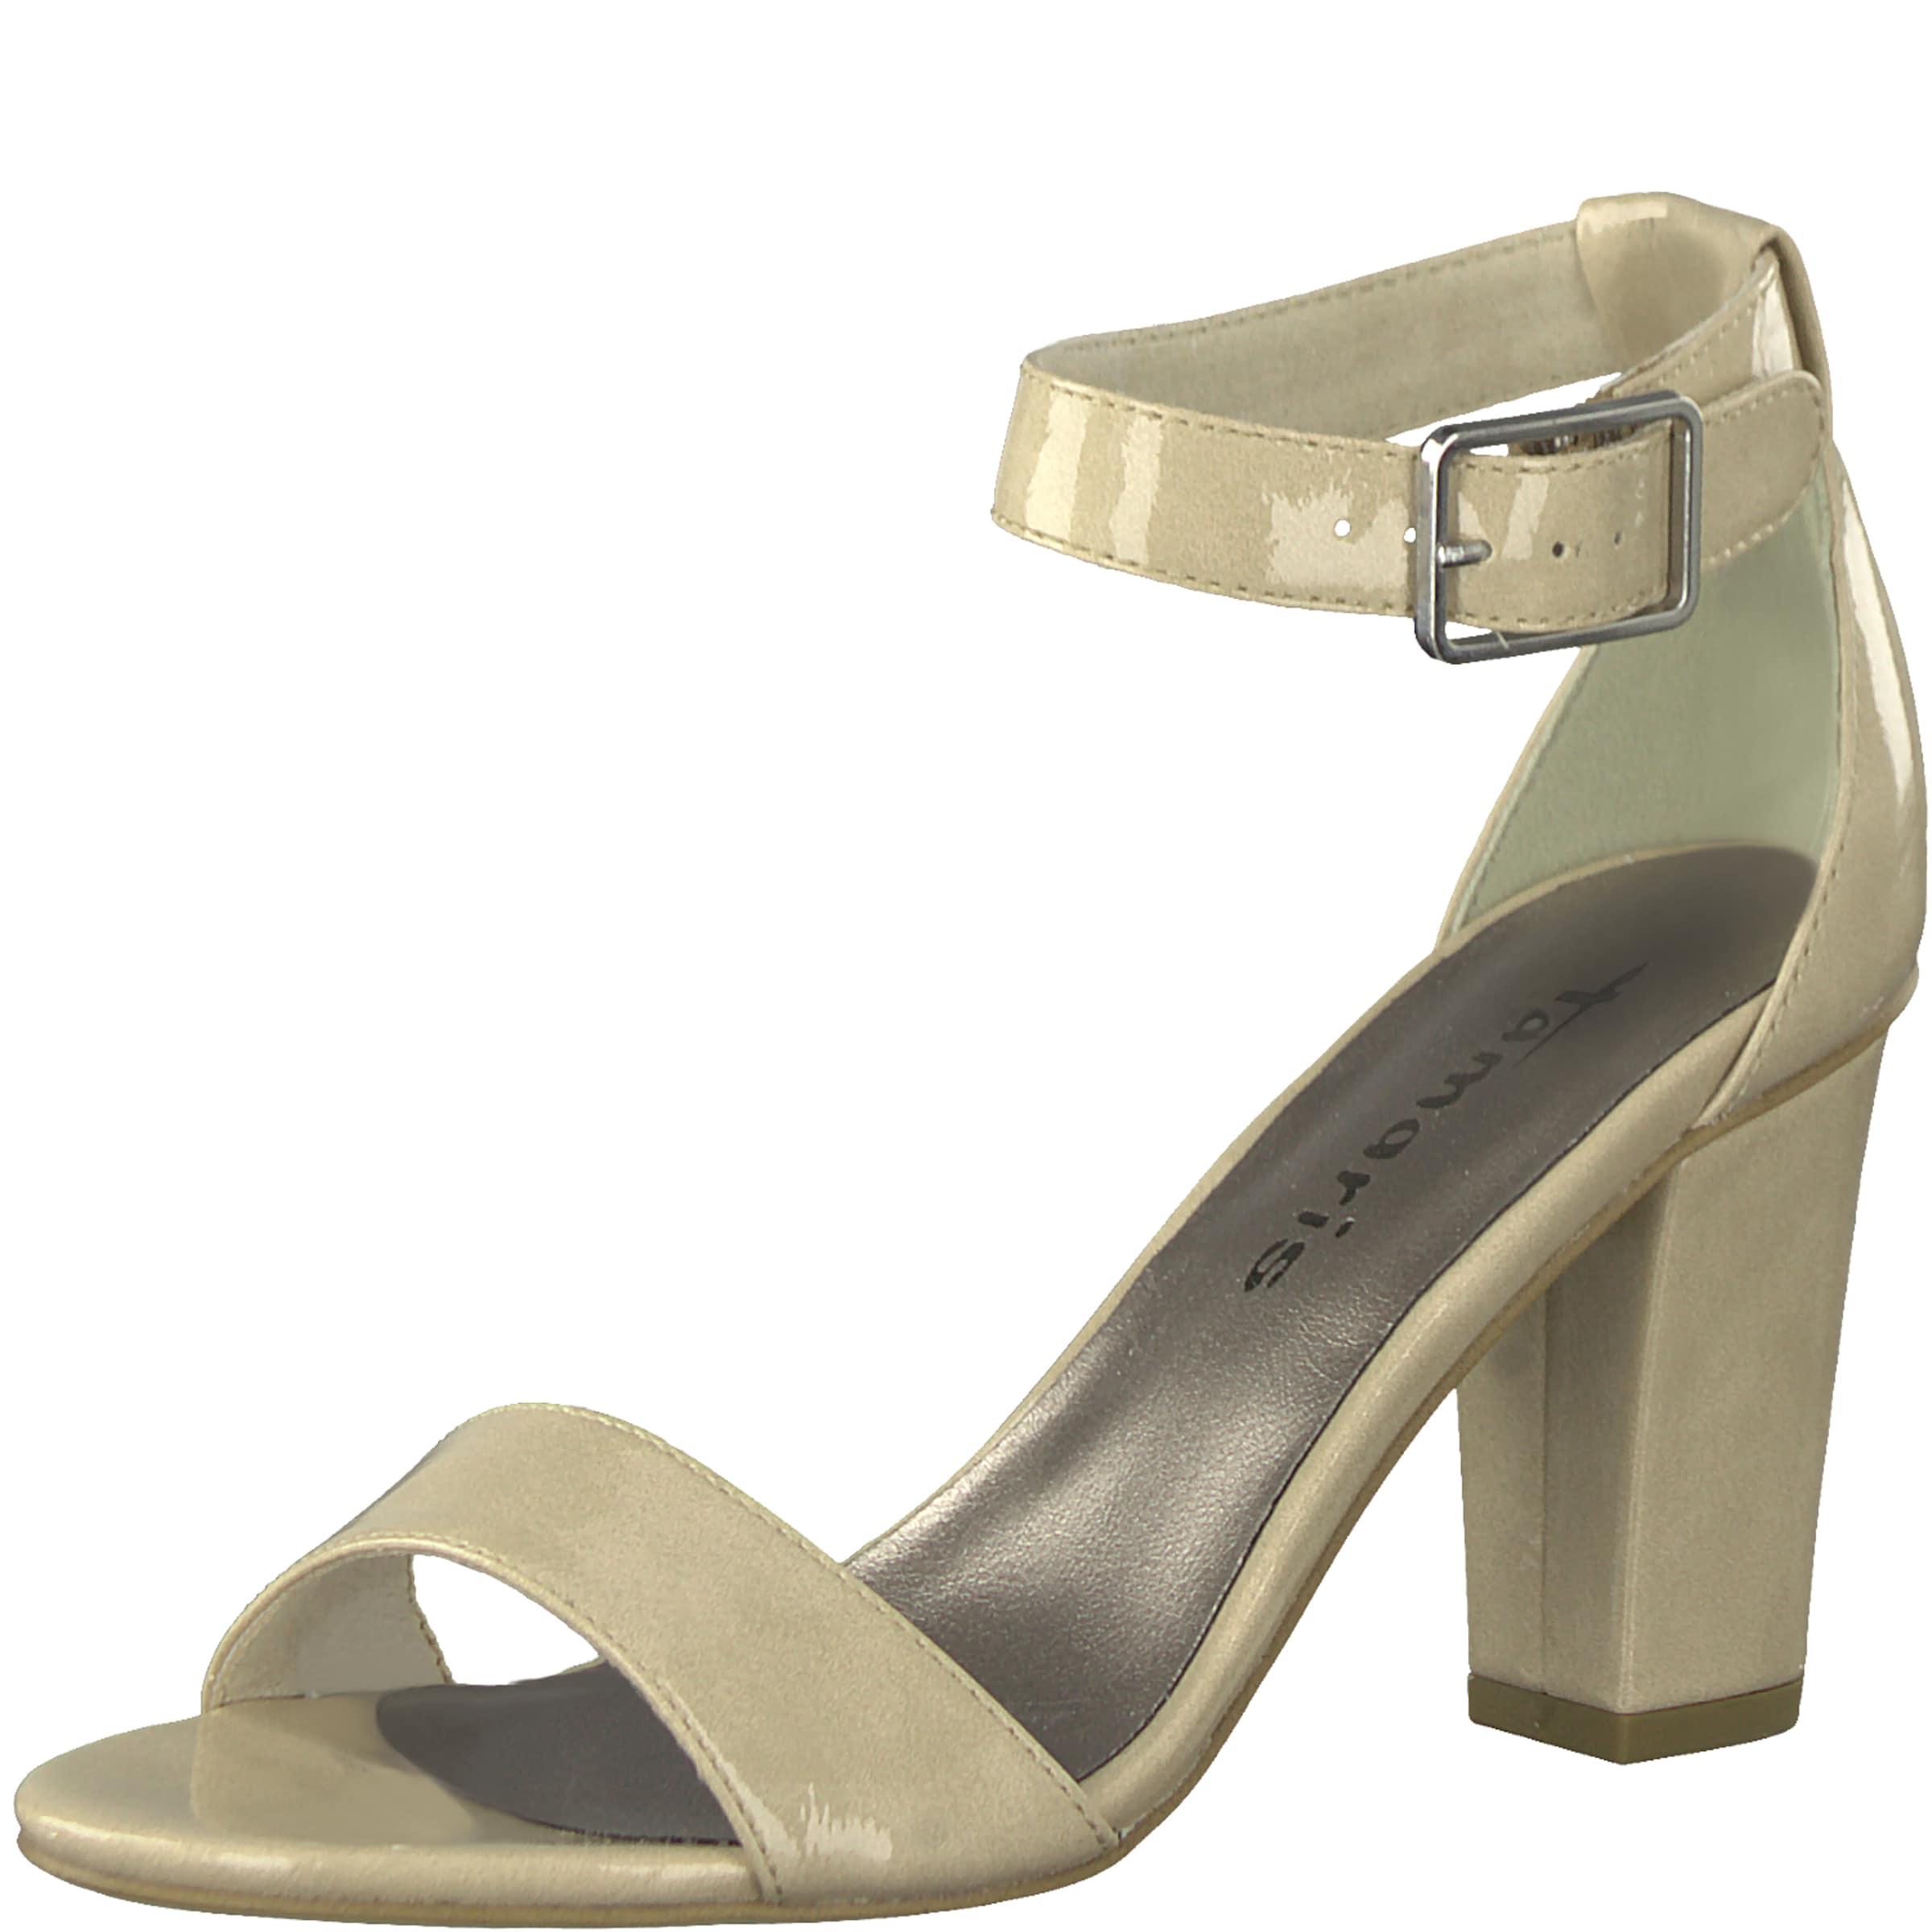 TAMARIS Slingpump Verschleißfeste billige Schuhe Hohe Qualität